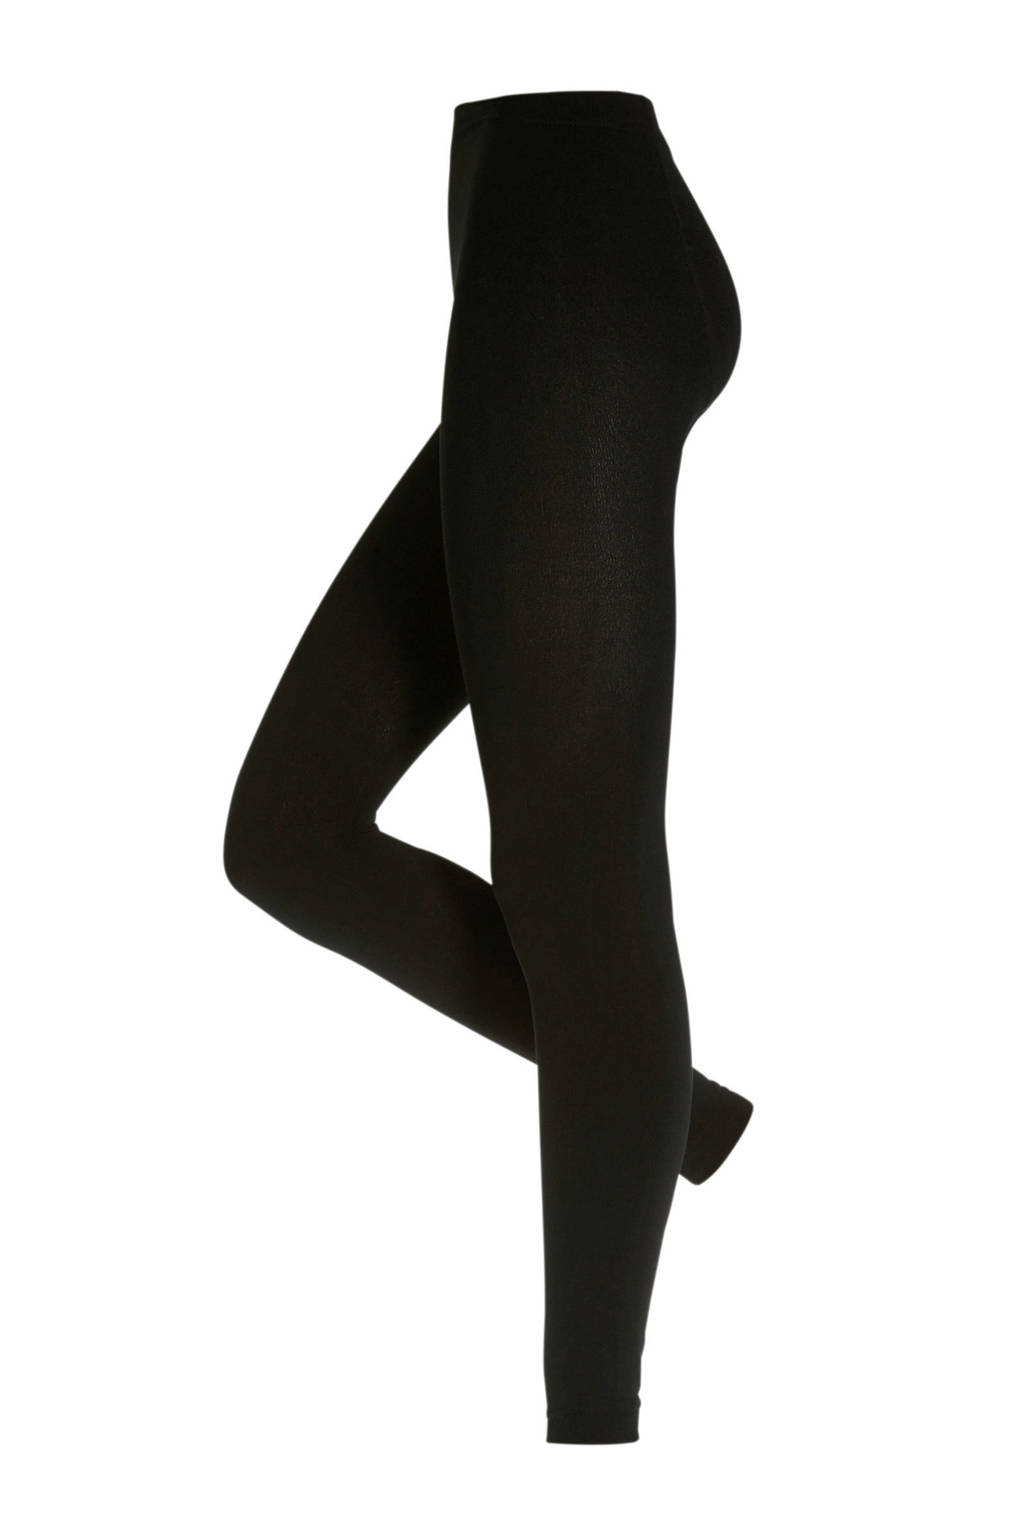 whkmp's own thermo legging - set van 2 zwart, Zwart